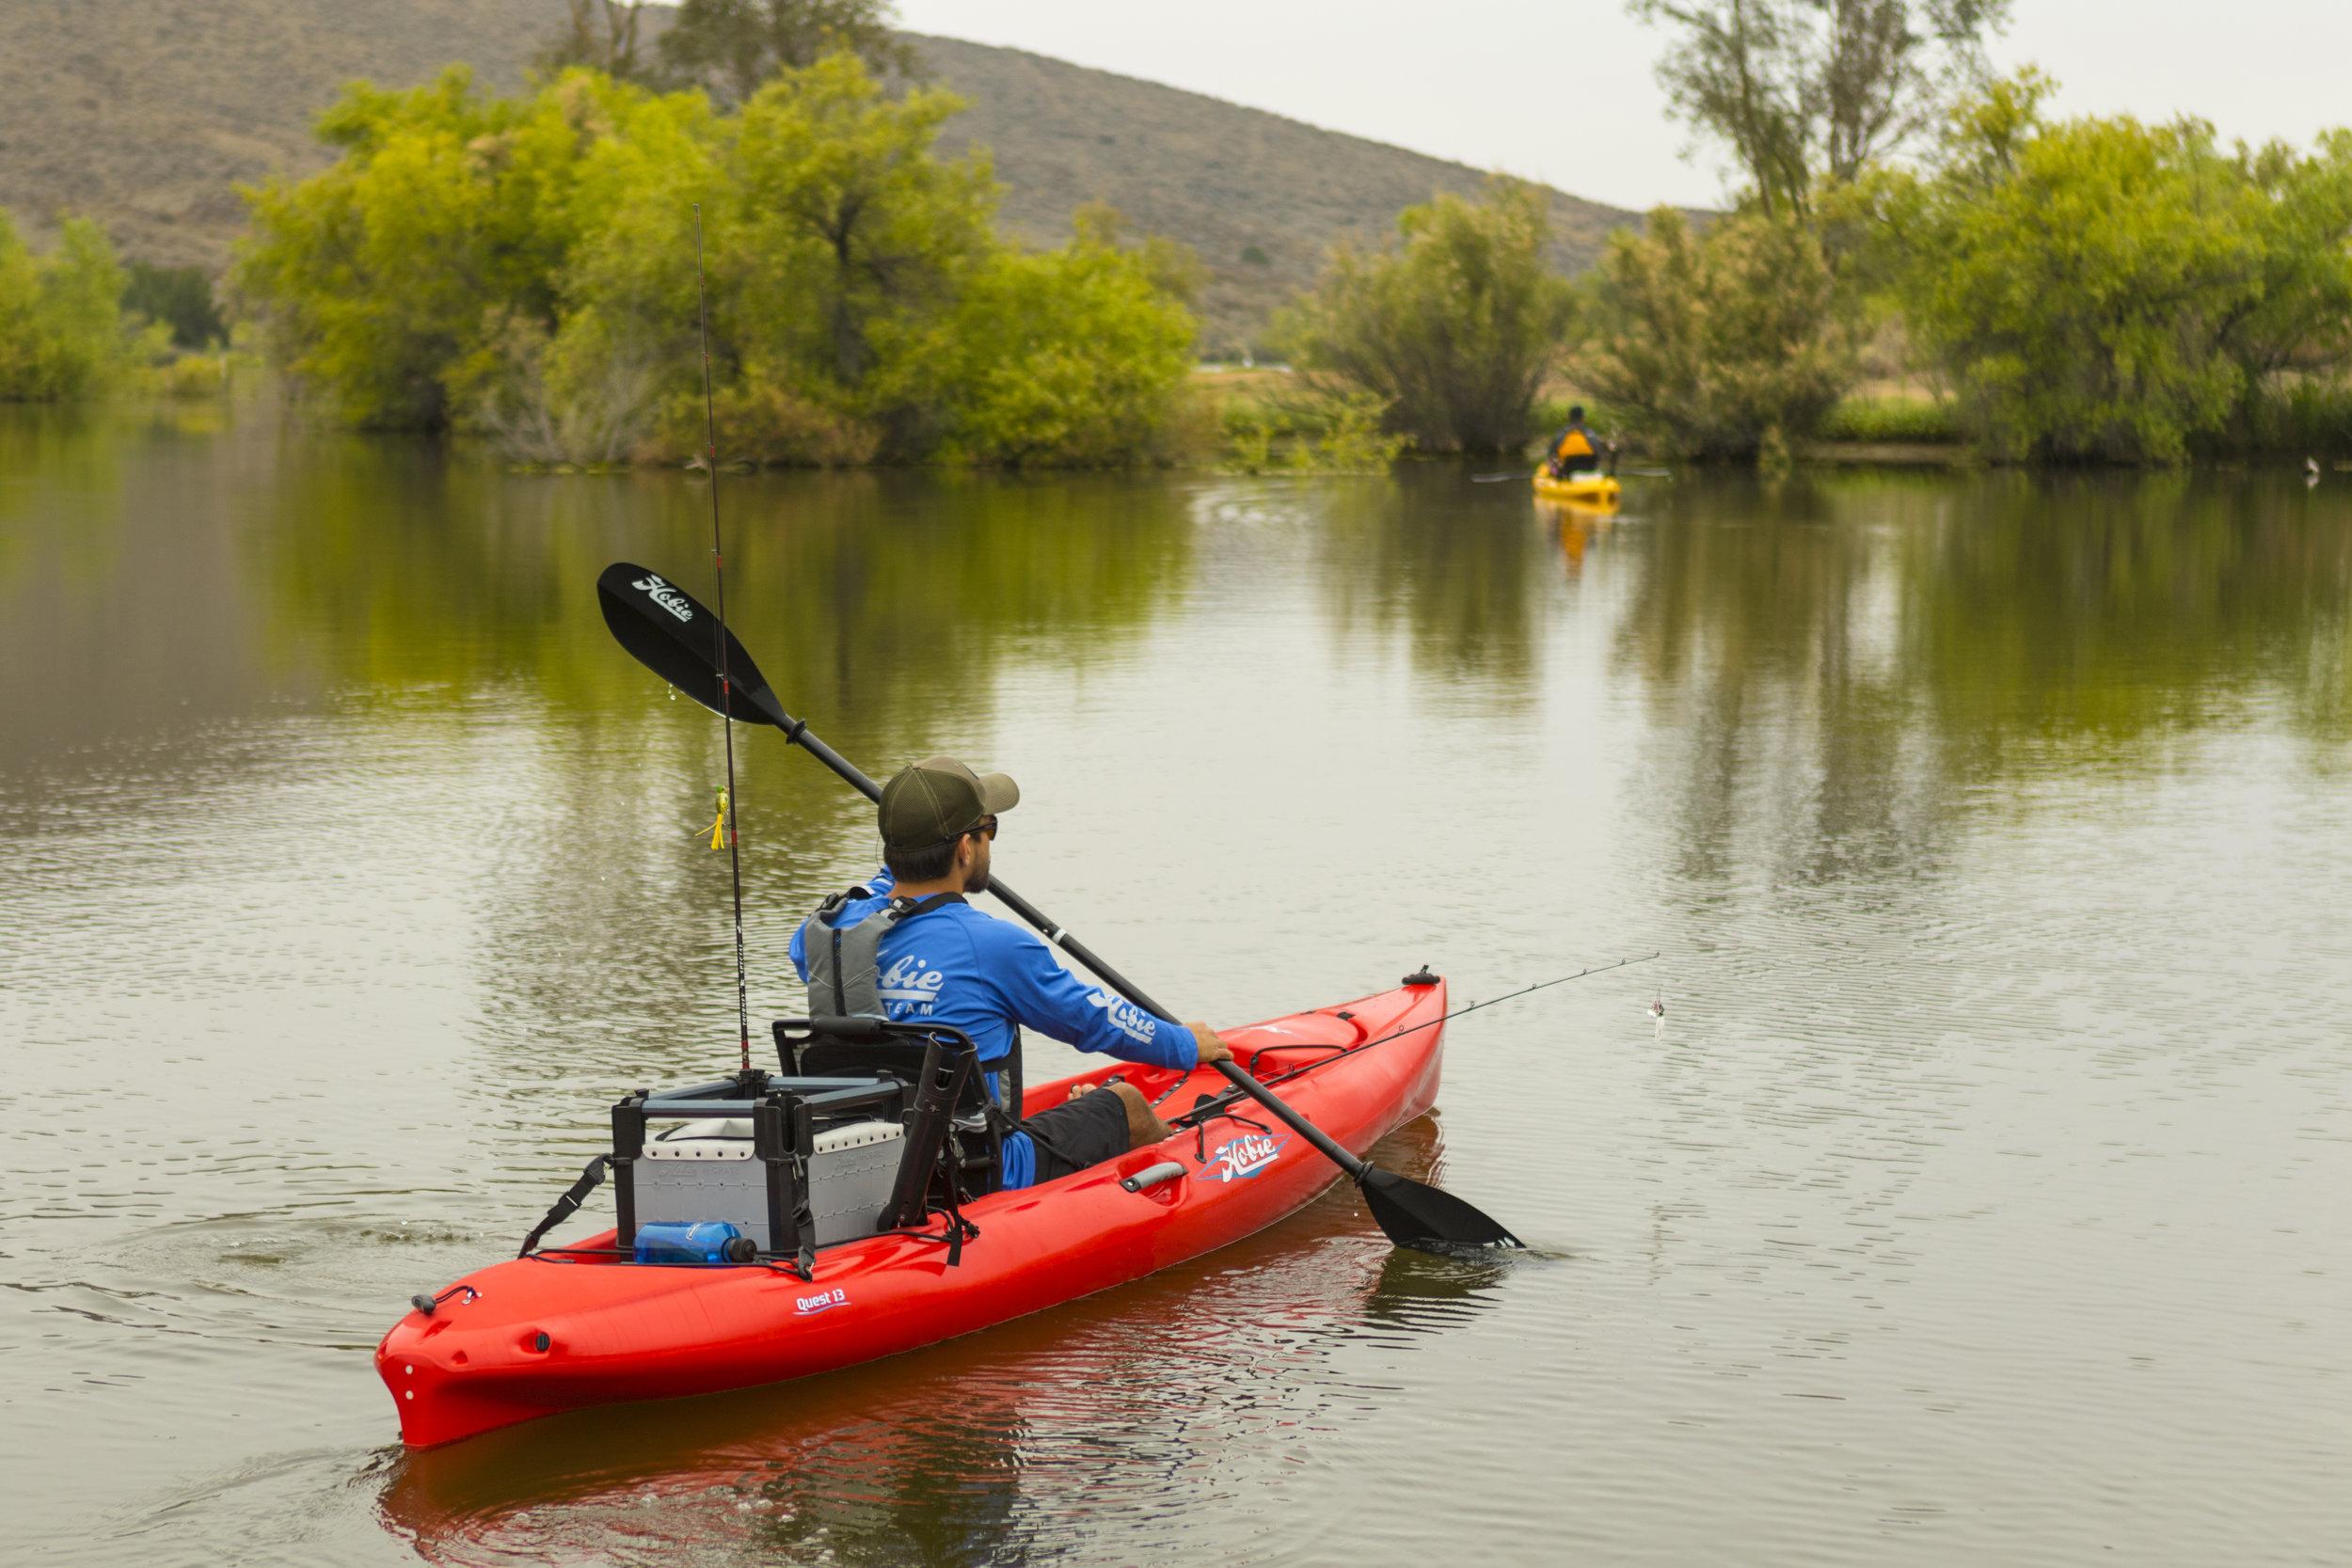 Quest13_fishing_Howie_Sam_CanyonLake_Paddling_8658_full.jpg